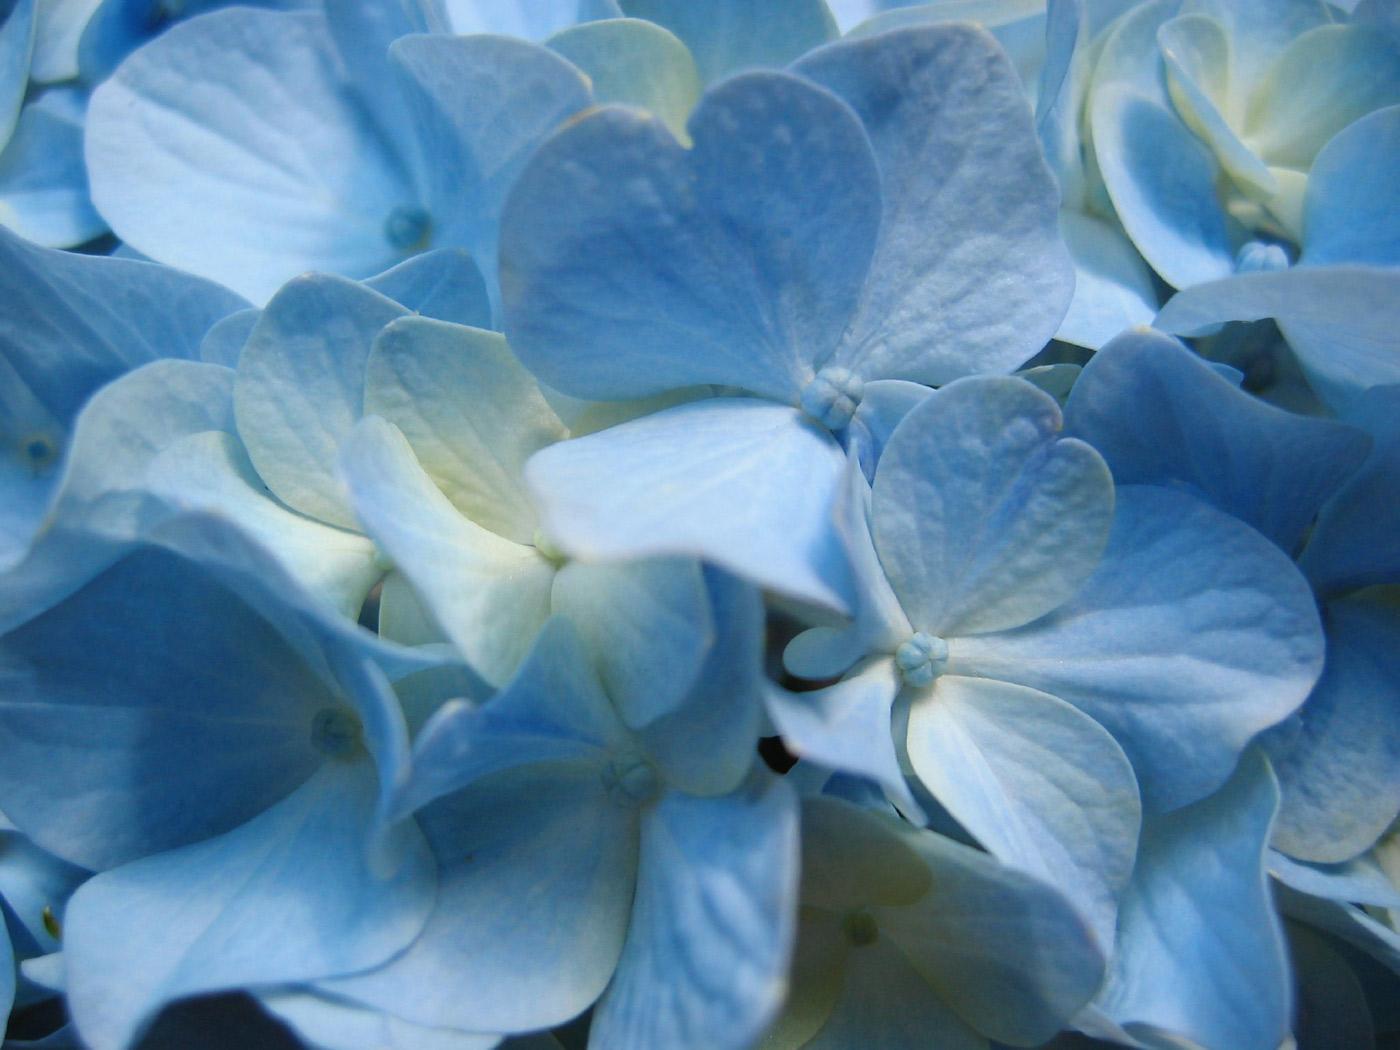 bluehydrangeaflowercloseupphotography.jpg